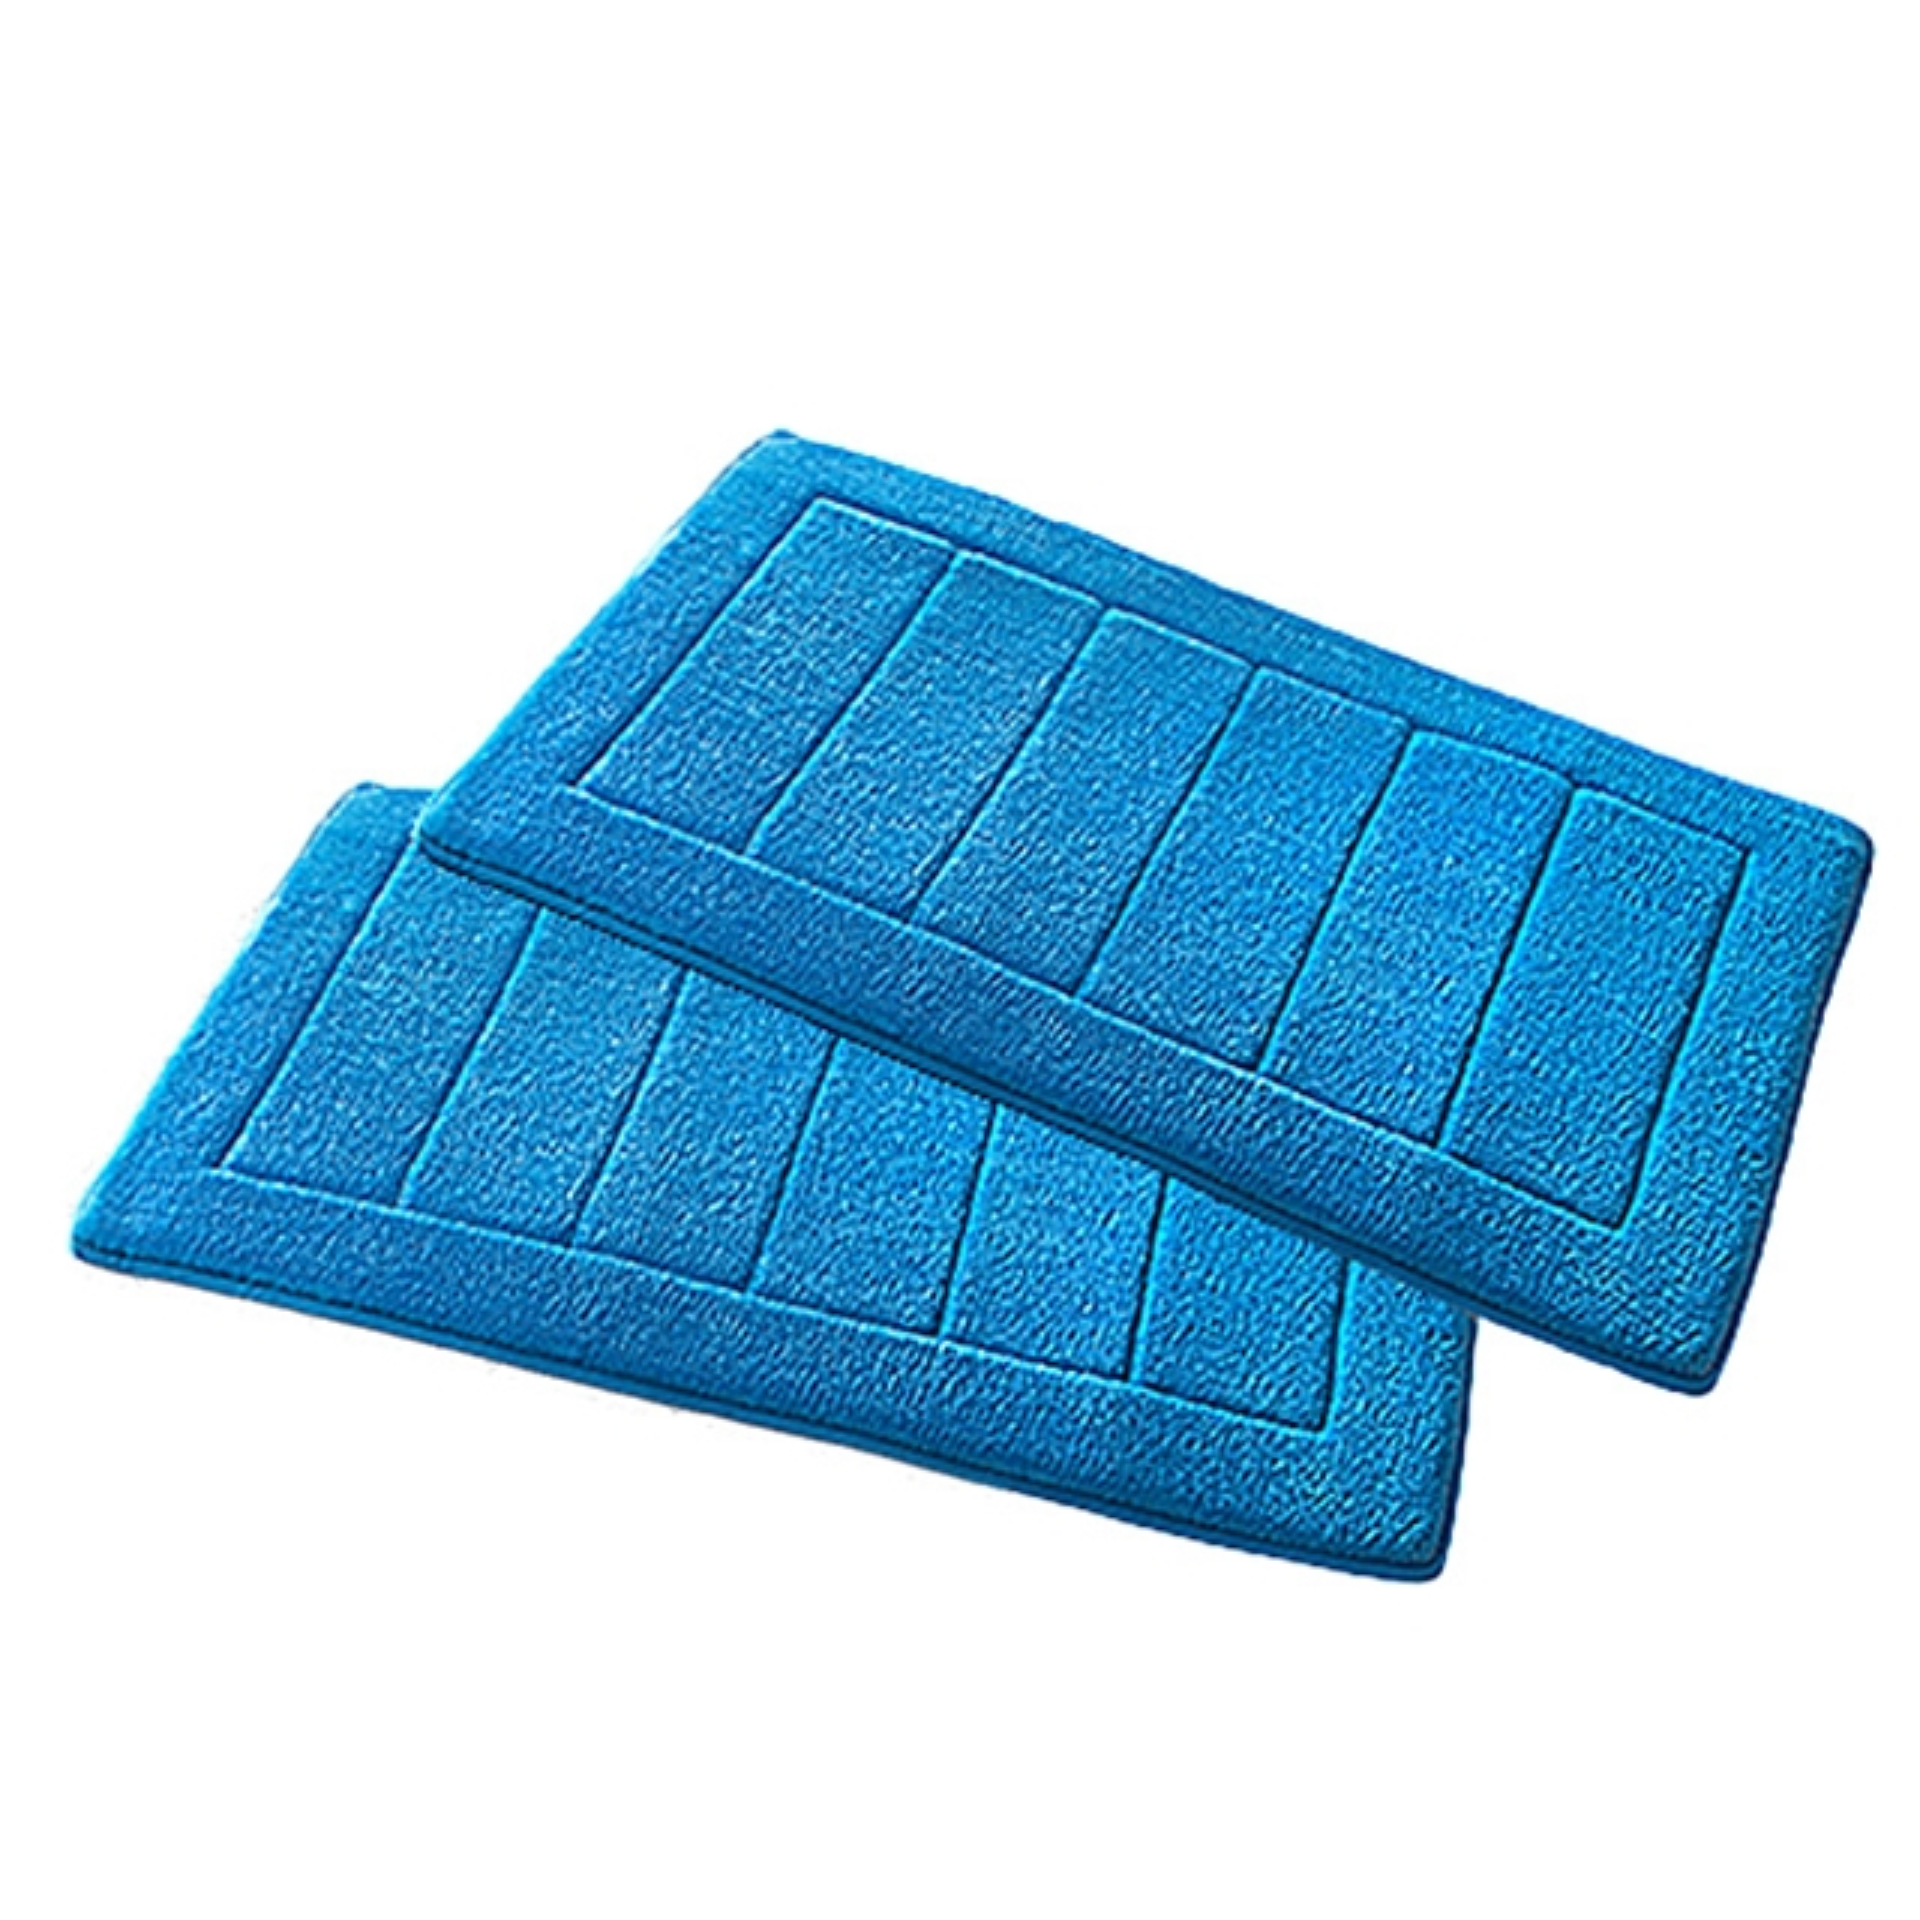 Memory-Foam Badezimmerteppich blau 2 Stk.